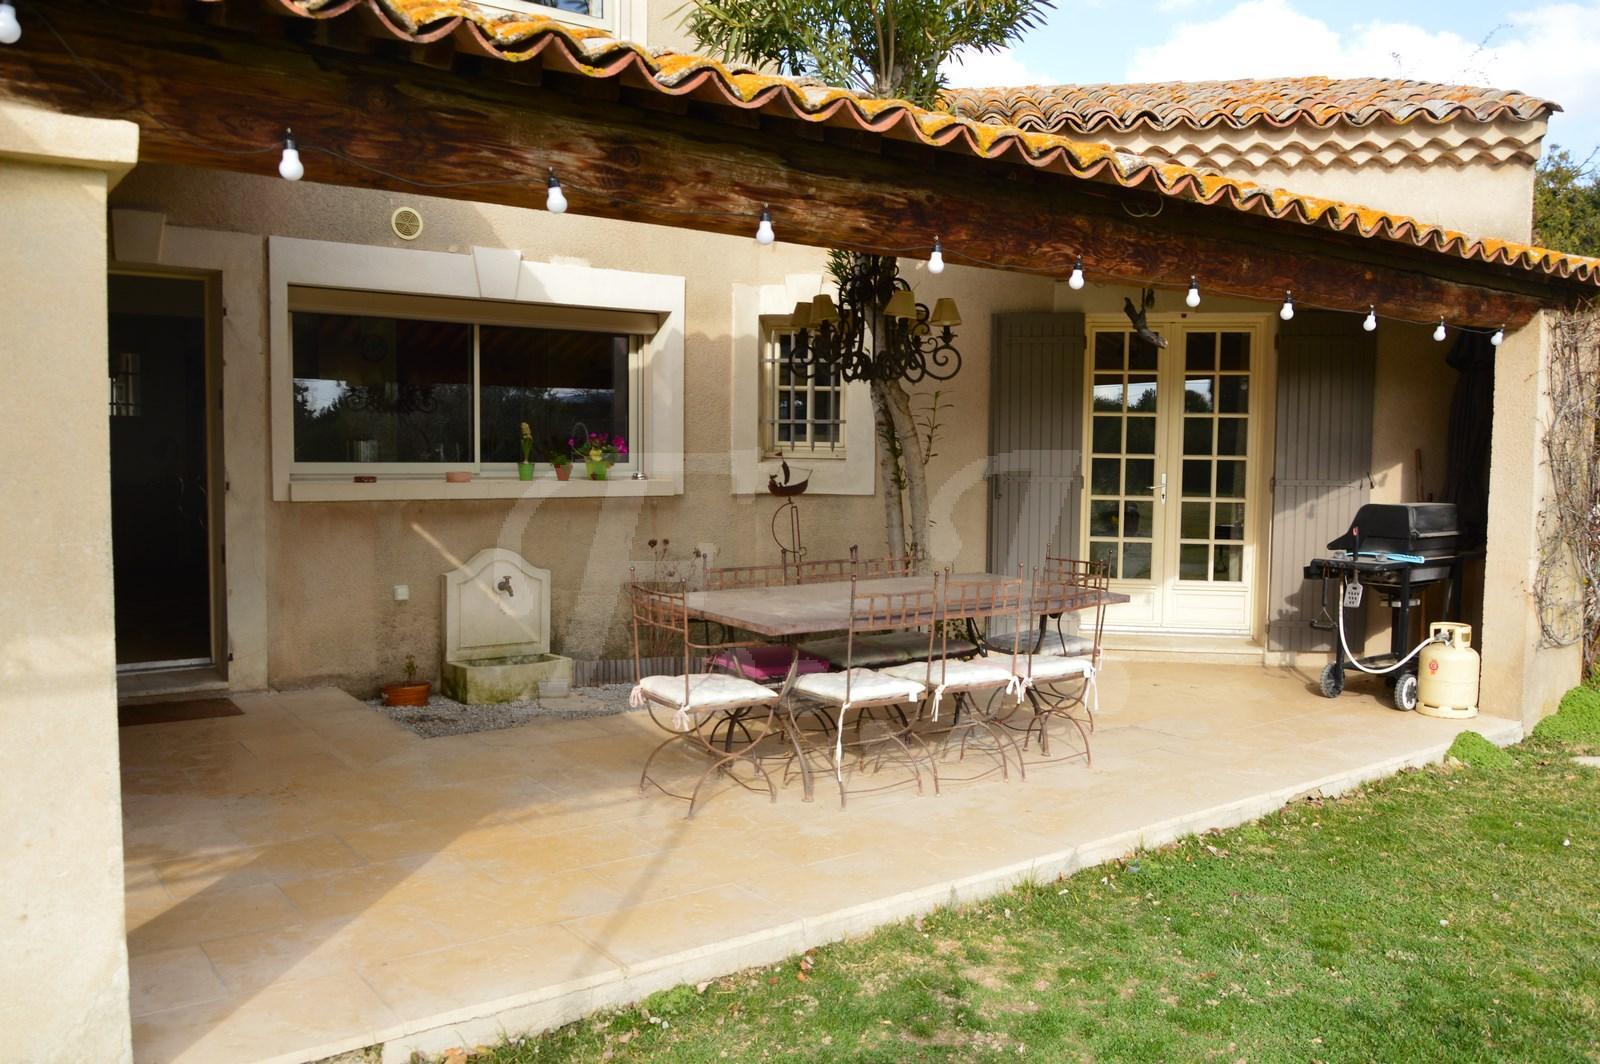 Vente maison avec terrasse ombragée, jardin et piscine